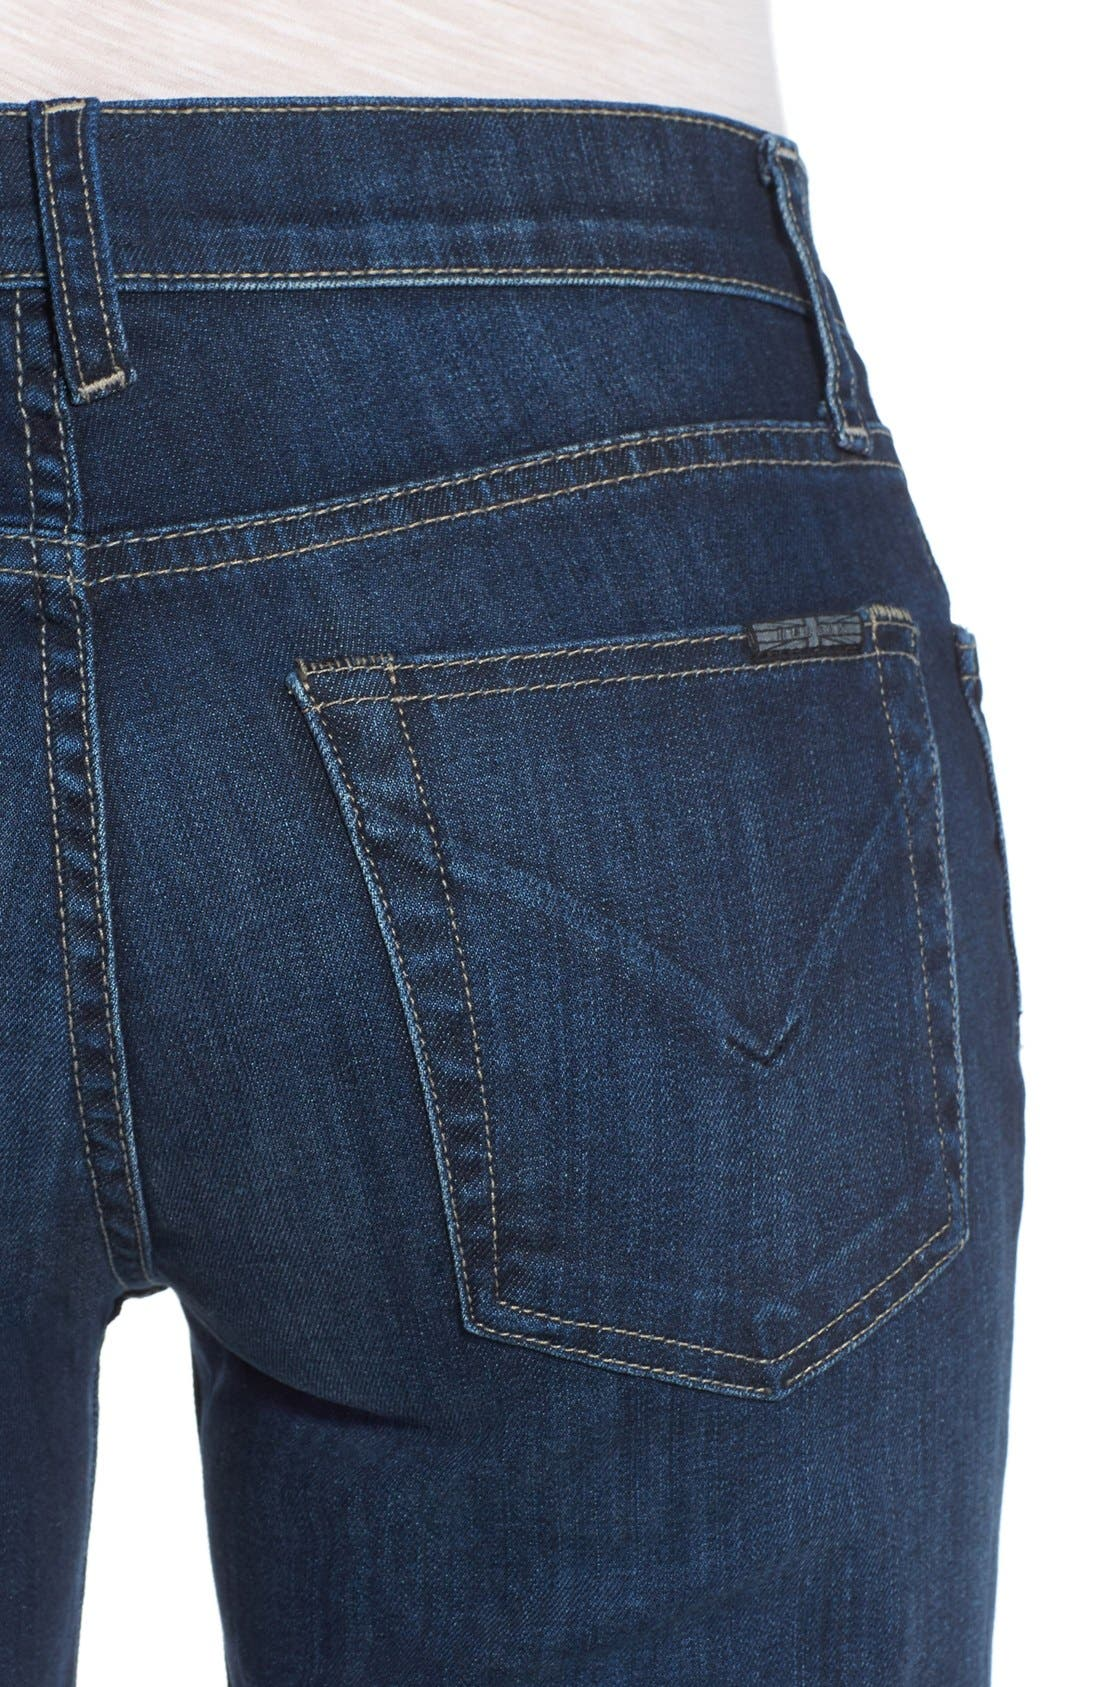 Alternate Image 4  - Hudson Jeans Piper Wide Leg Jeans (Thruway)